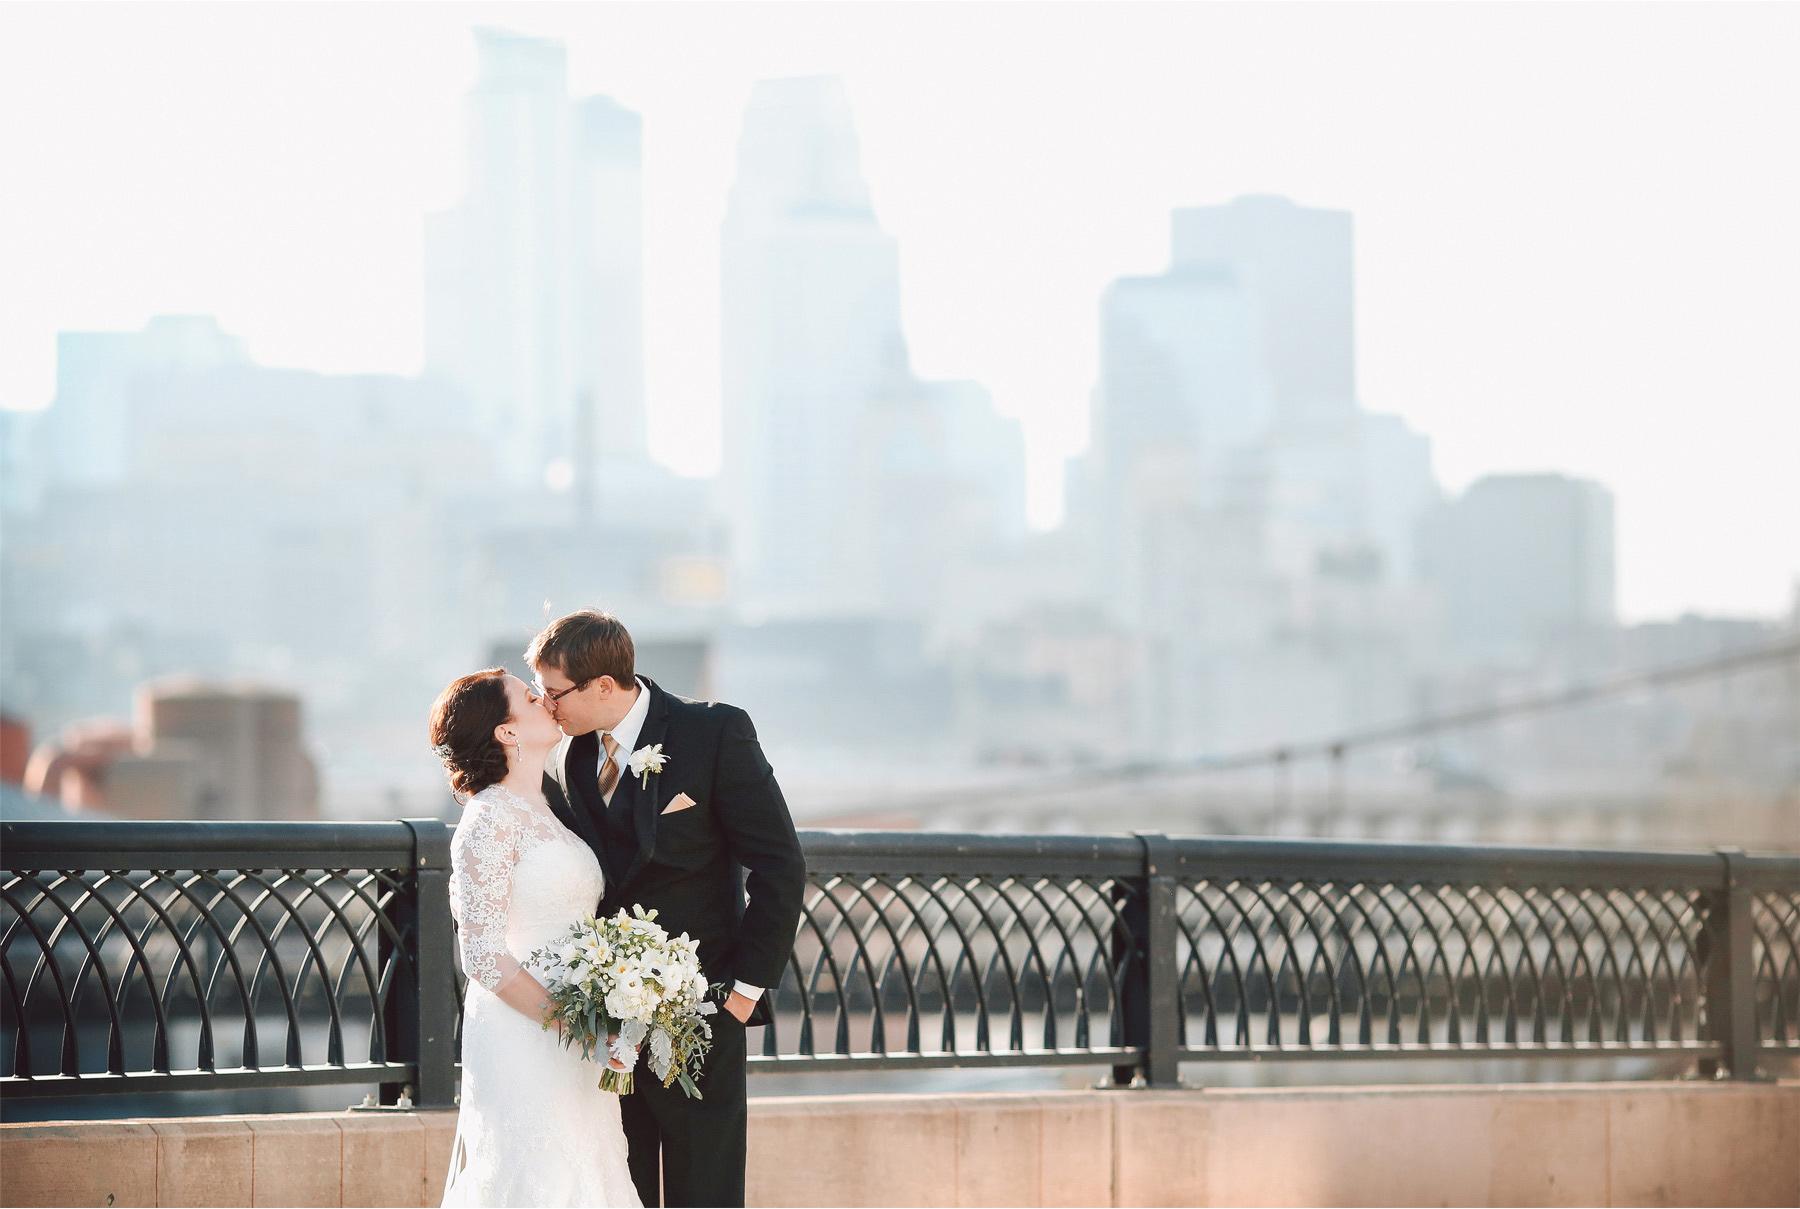 10-Minneapolis-Minnesota-Wedding-Photographer-by-Andrew-Vick-Photography-Winter-Bride-Groom-Downtown-Skyline-Kiss-Vintage-Sara-and-Rob.jpg